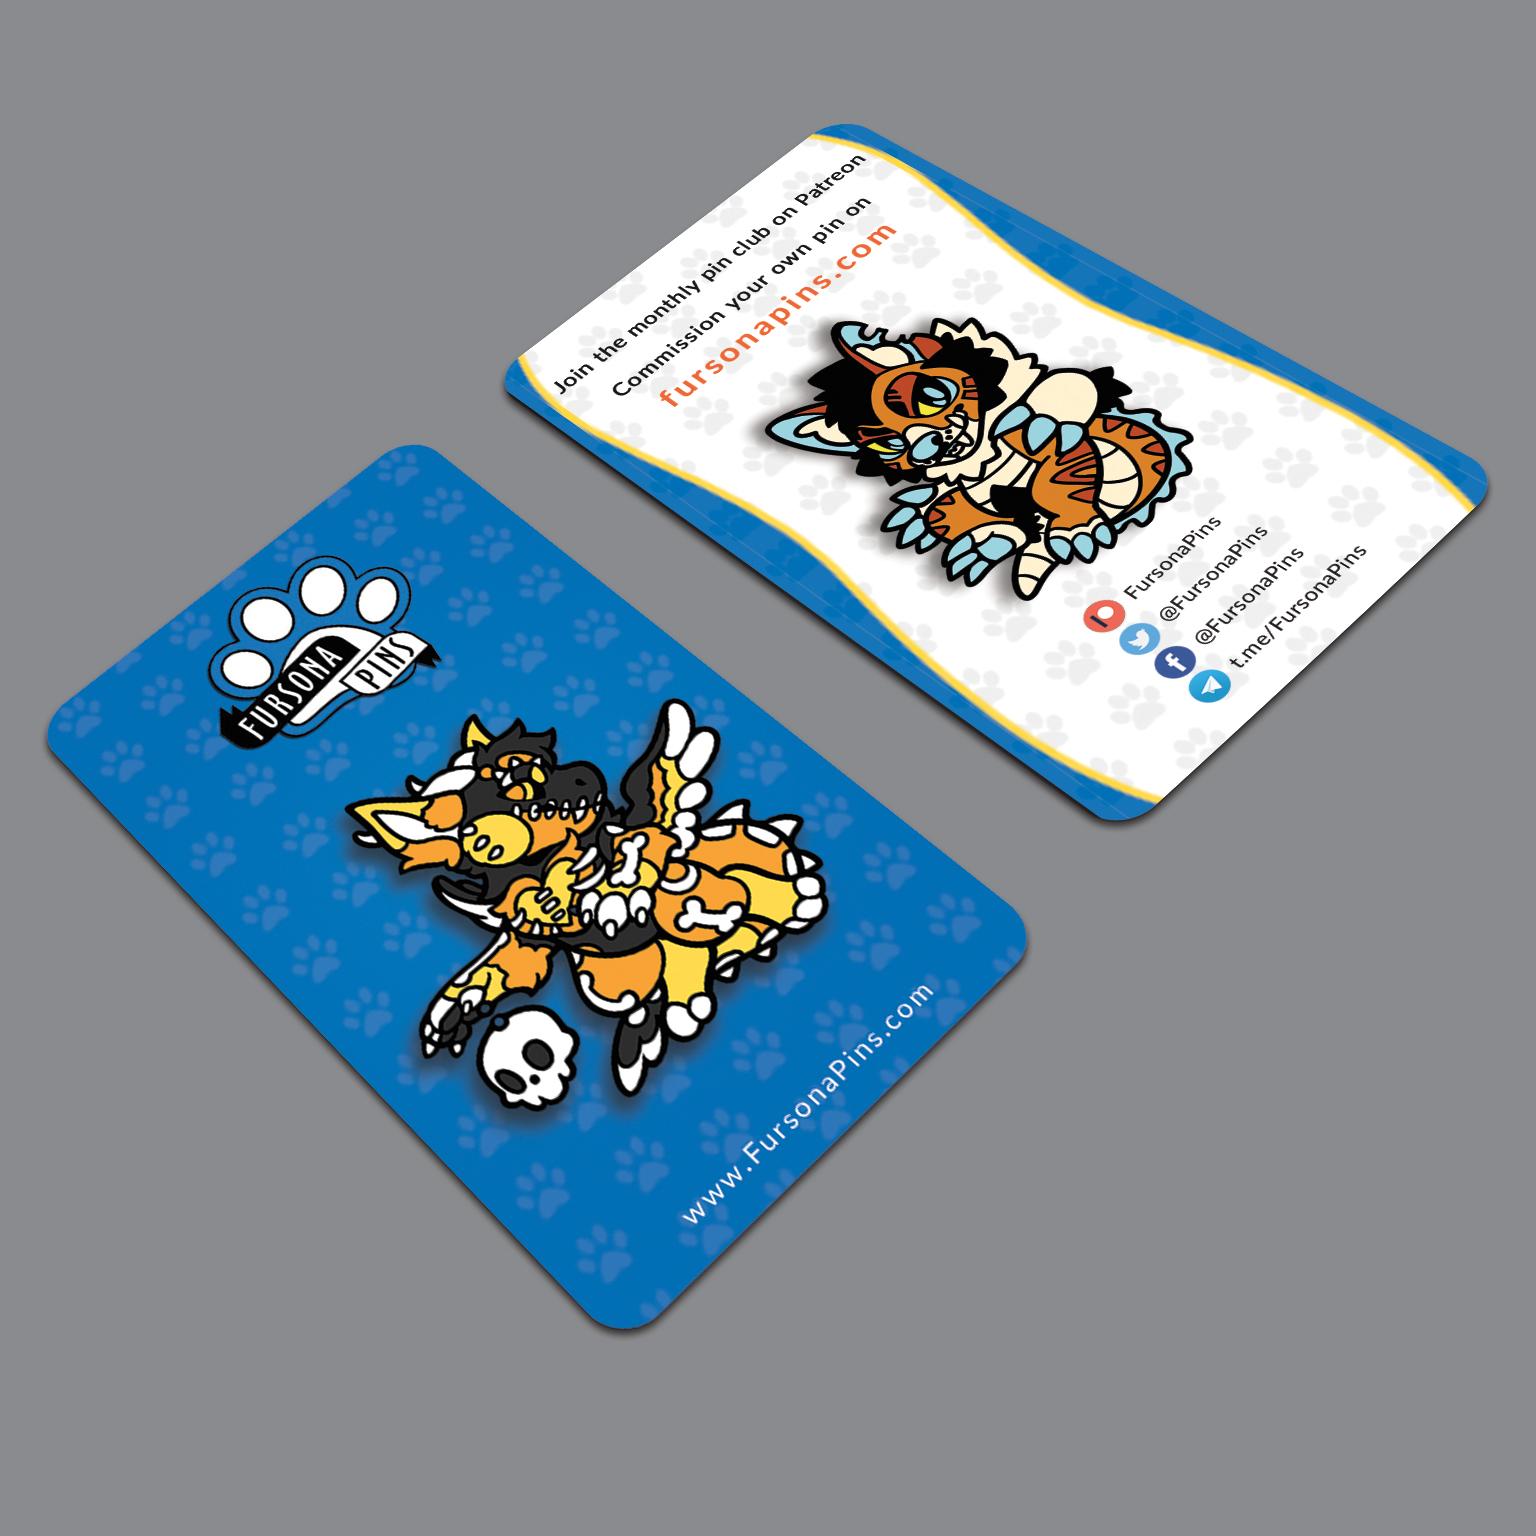 Fursona Pins Business Card